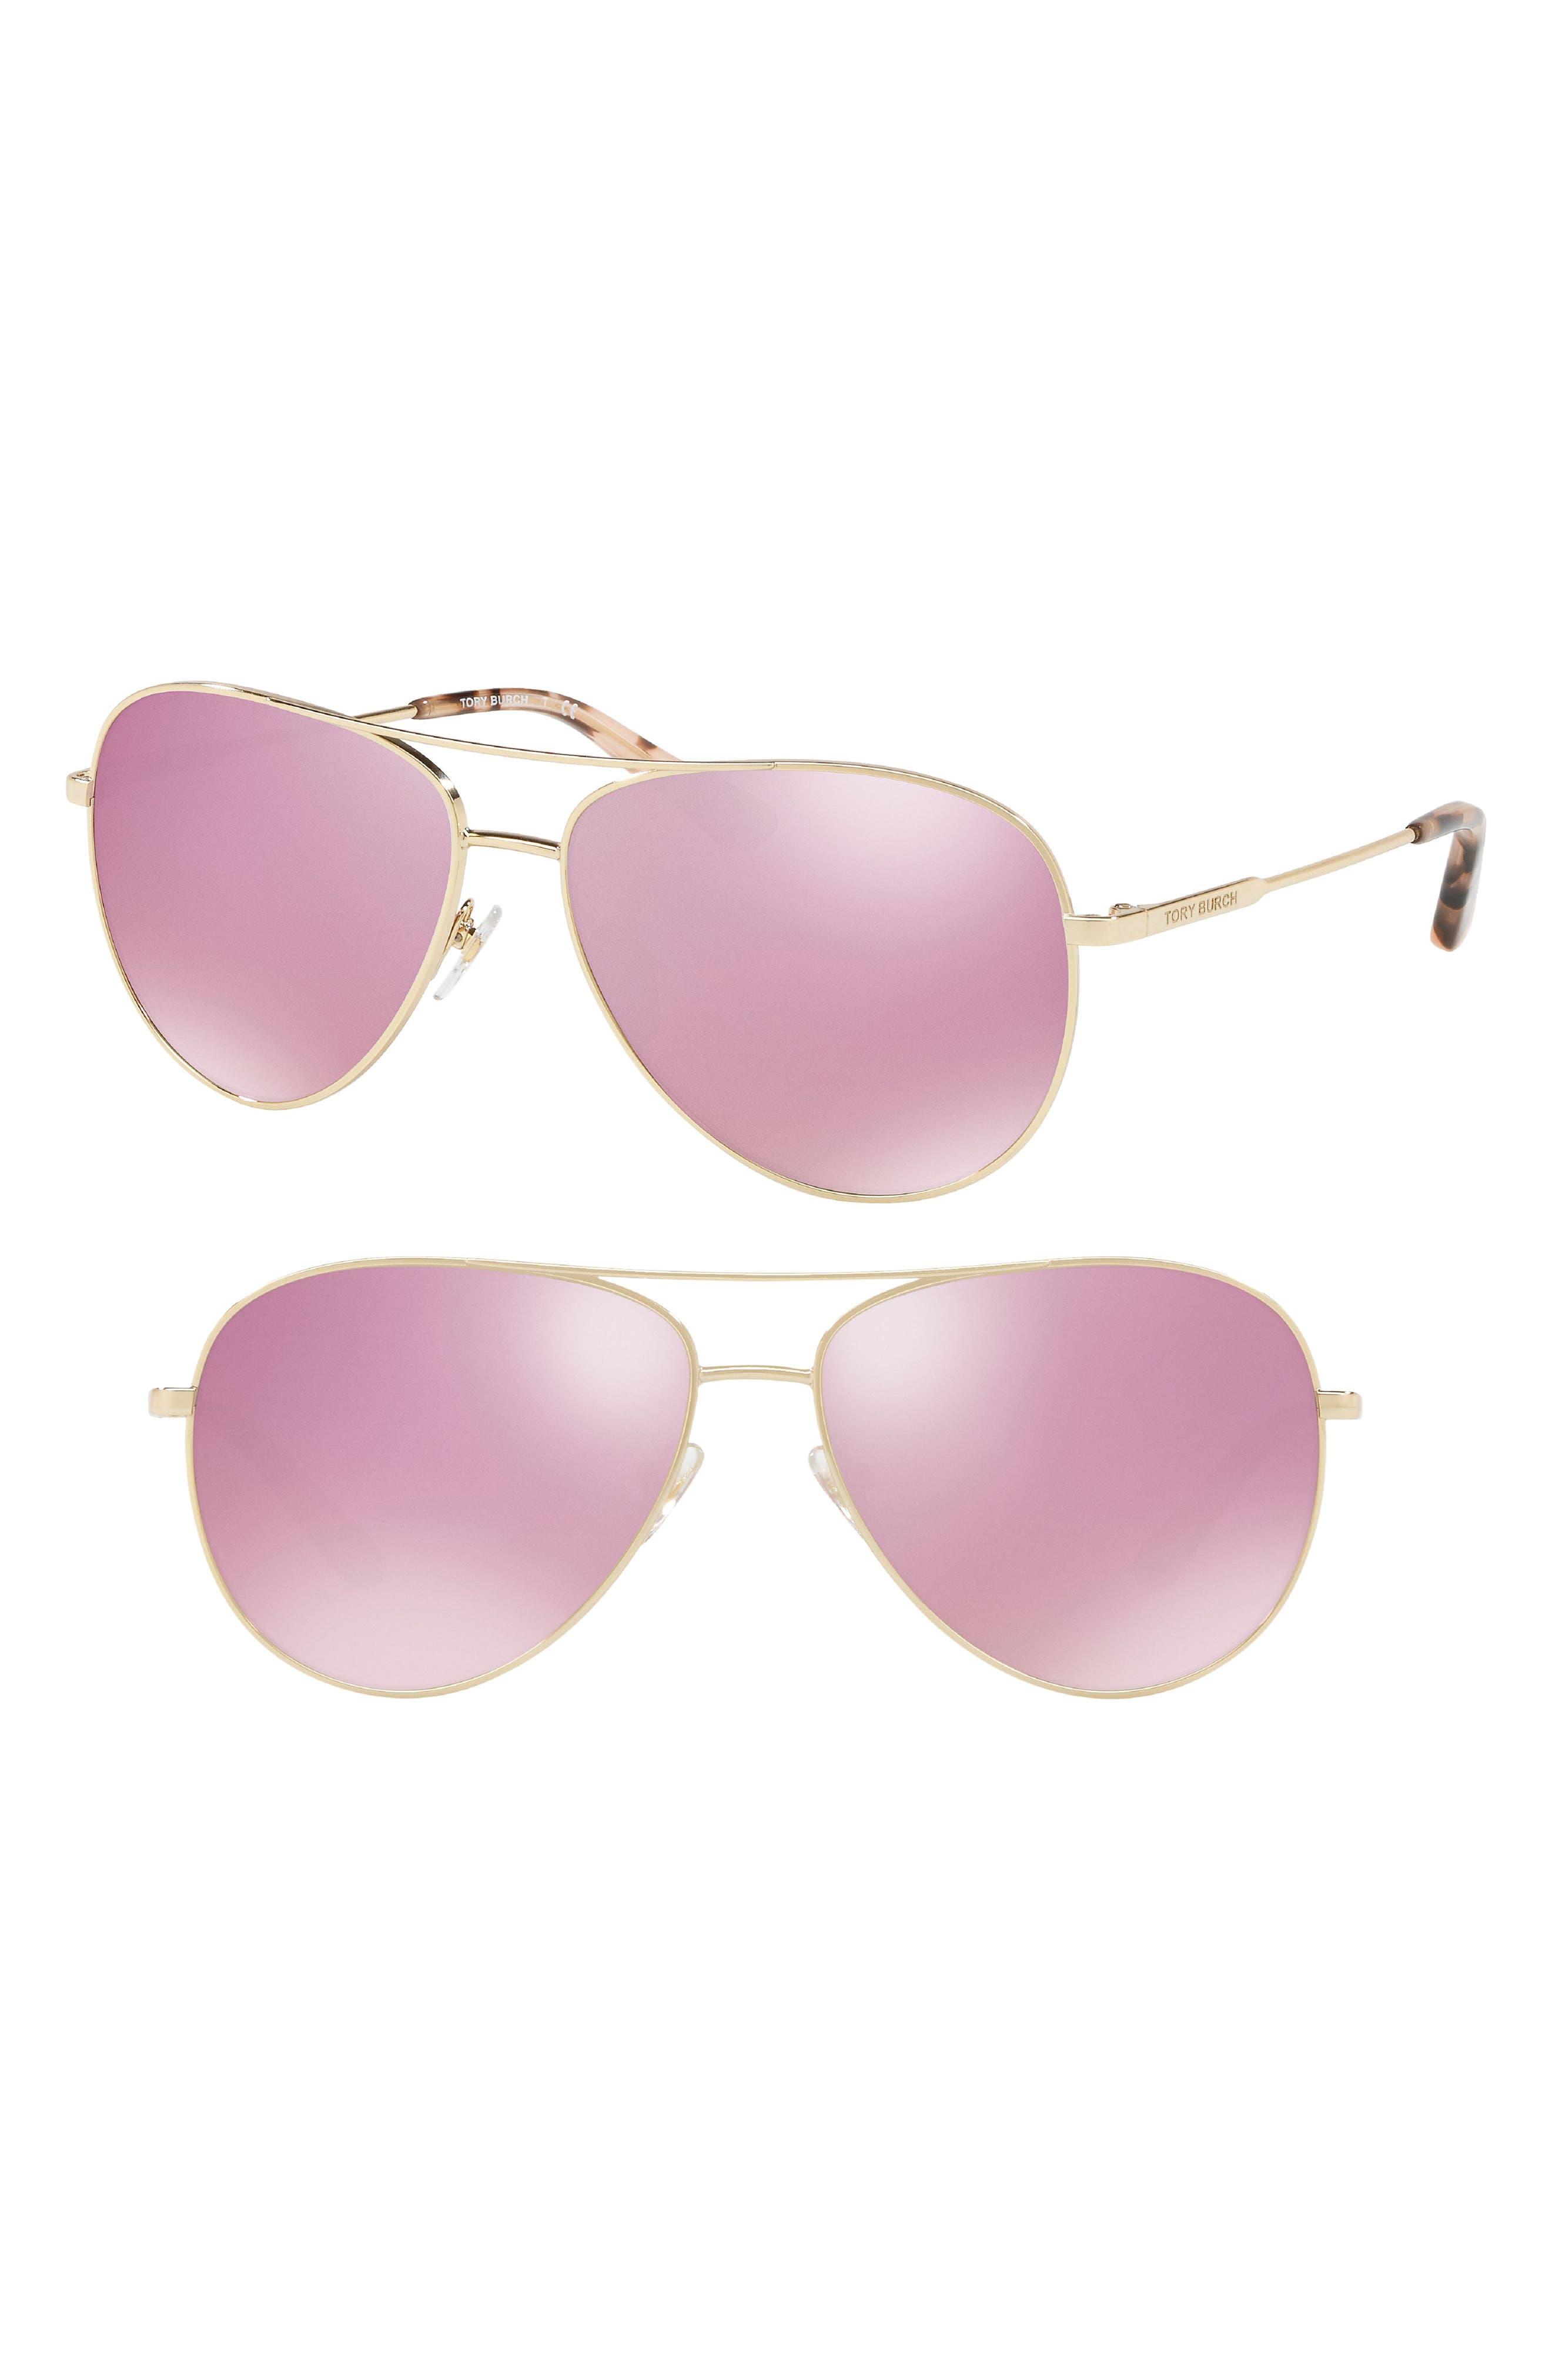 59mm Thin Metal Aviator Sunglasses,                         Main,                         color, PINK